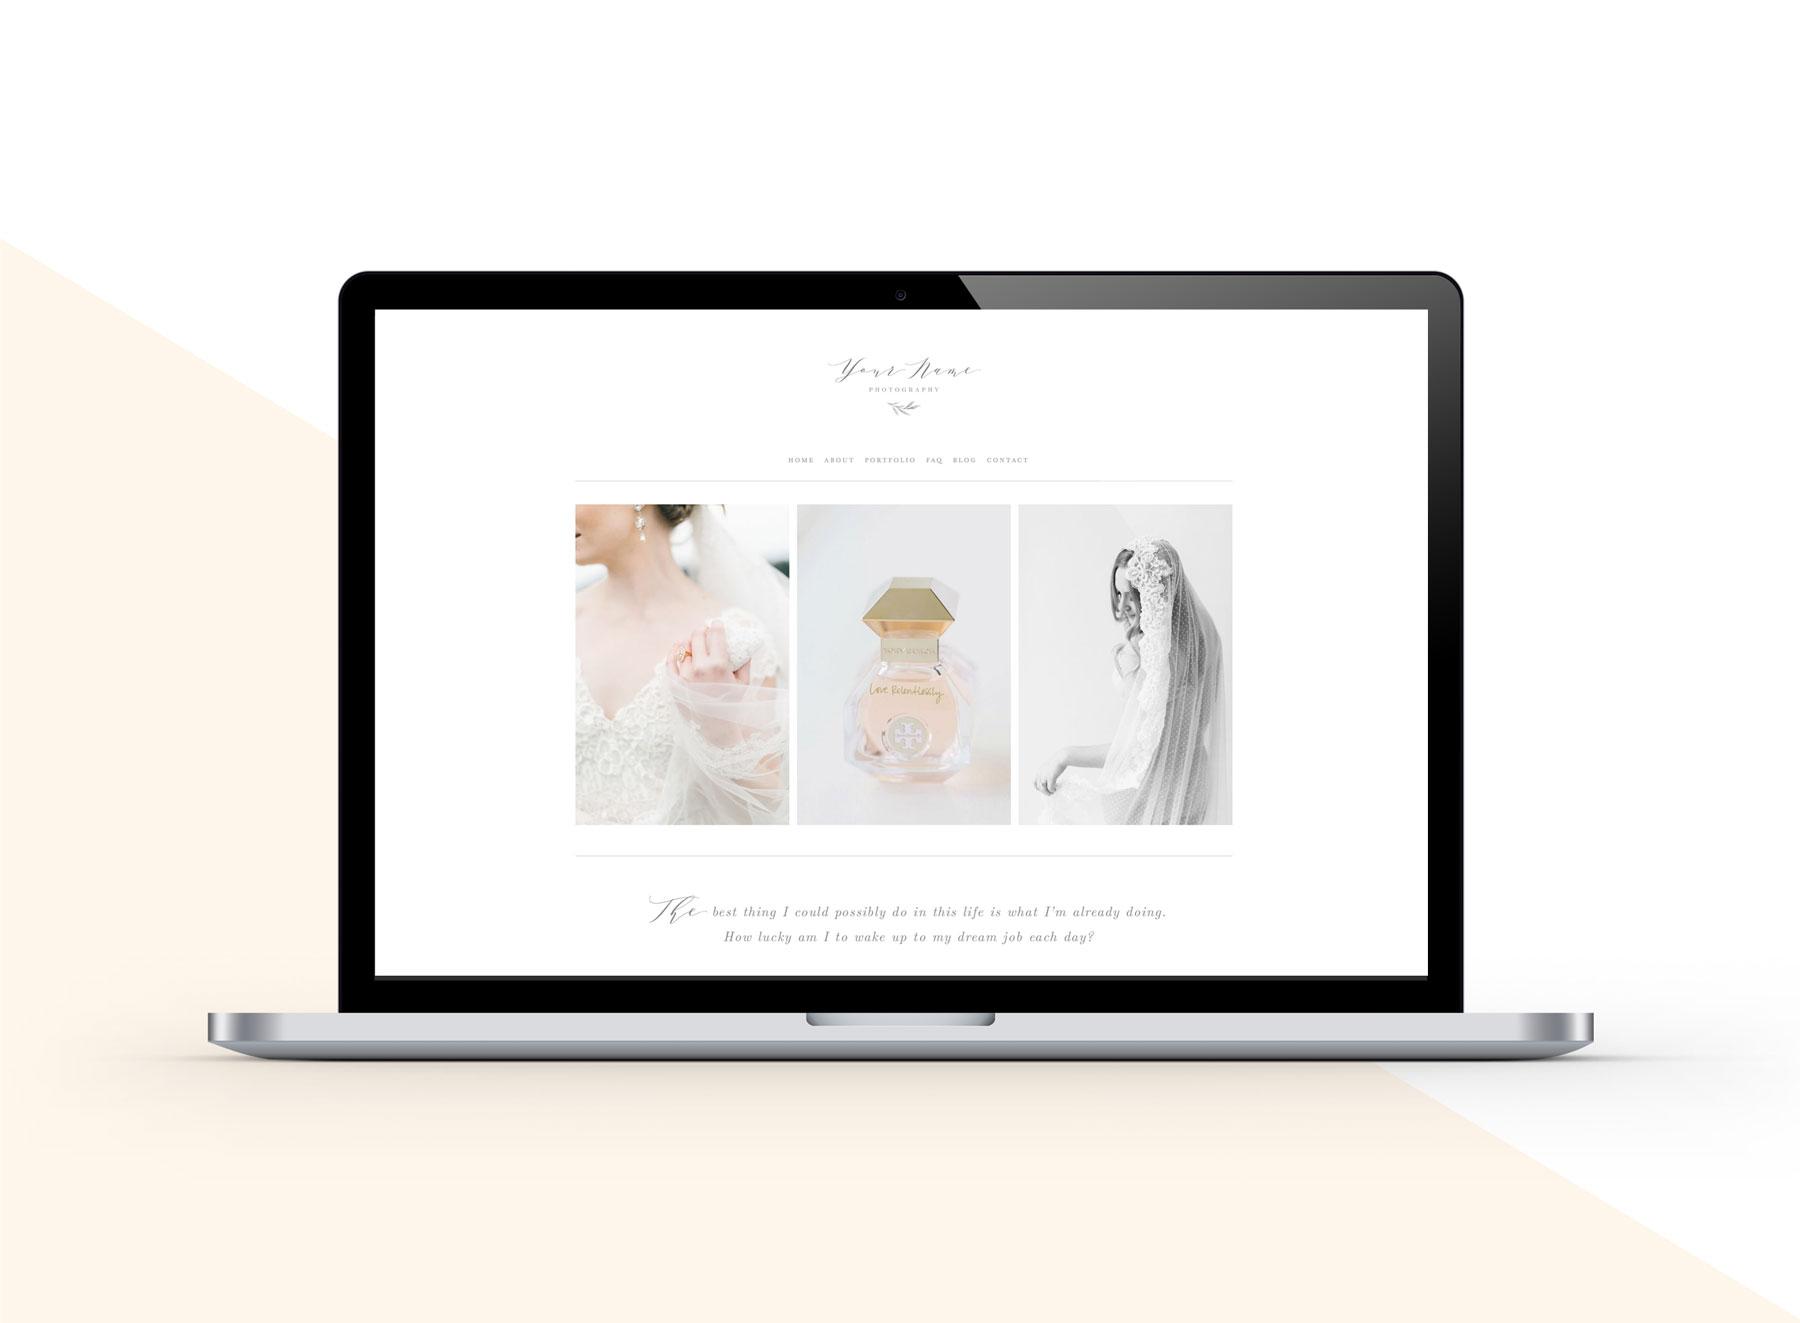 squarespace website templates | squarespace design kits | bittersweet design boutique